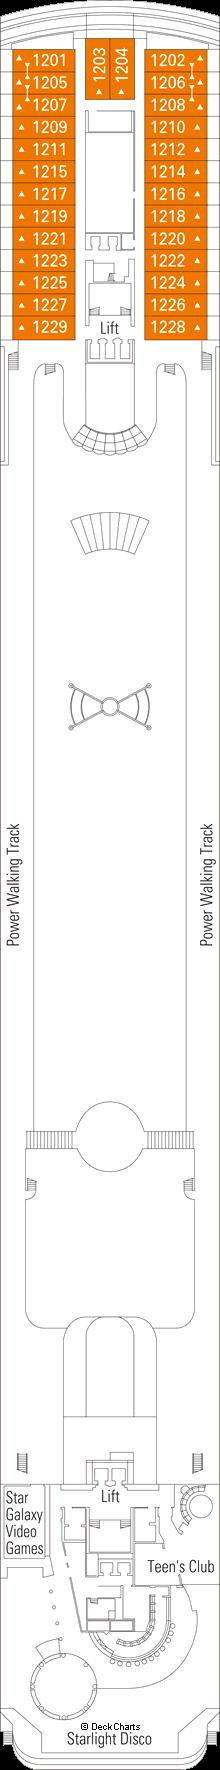 MSC Armonia: Zaffiro Deck